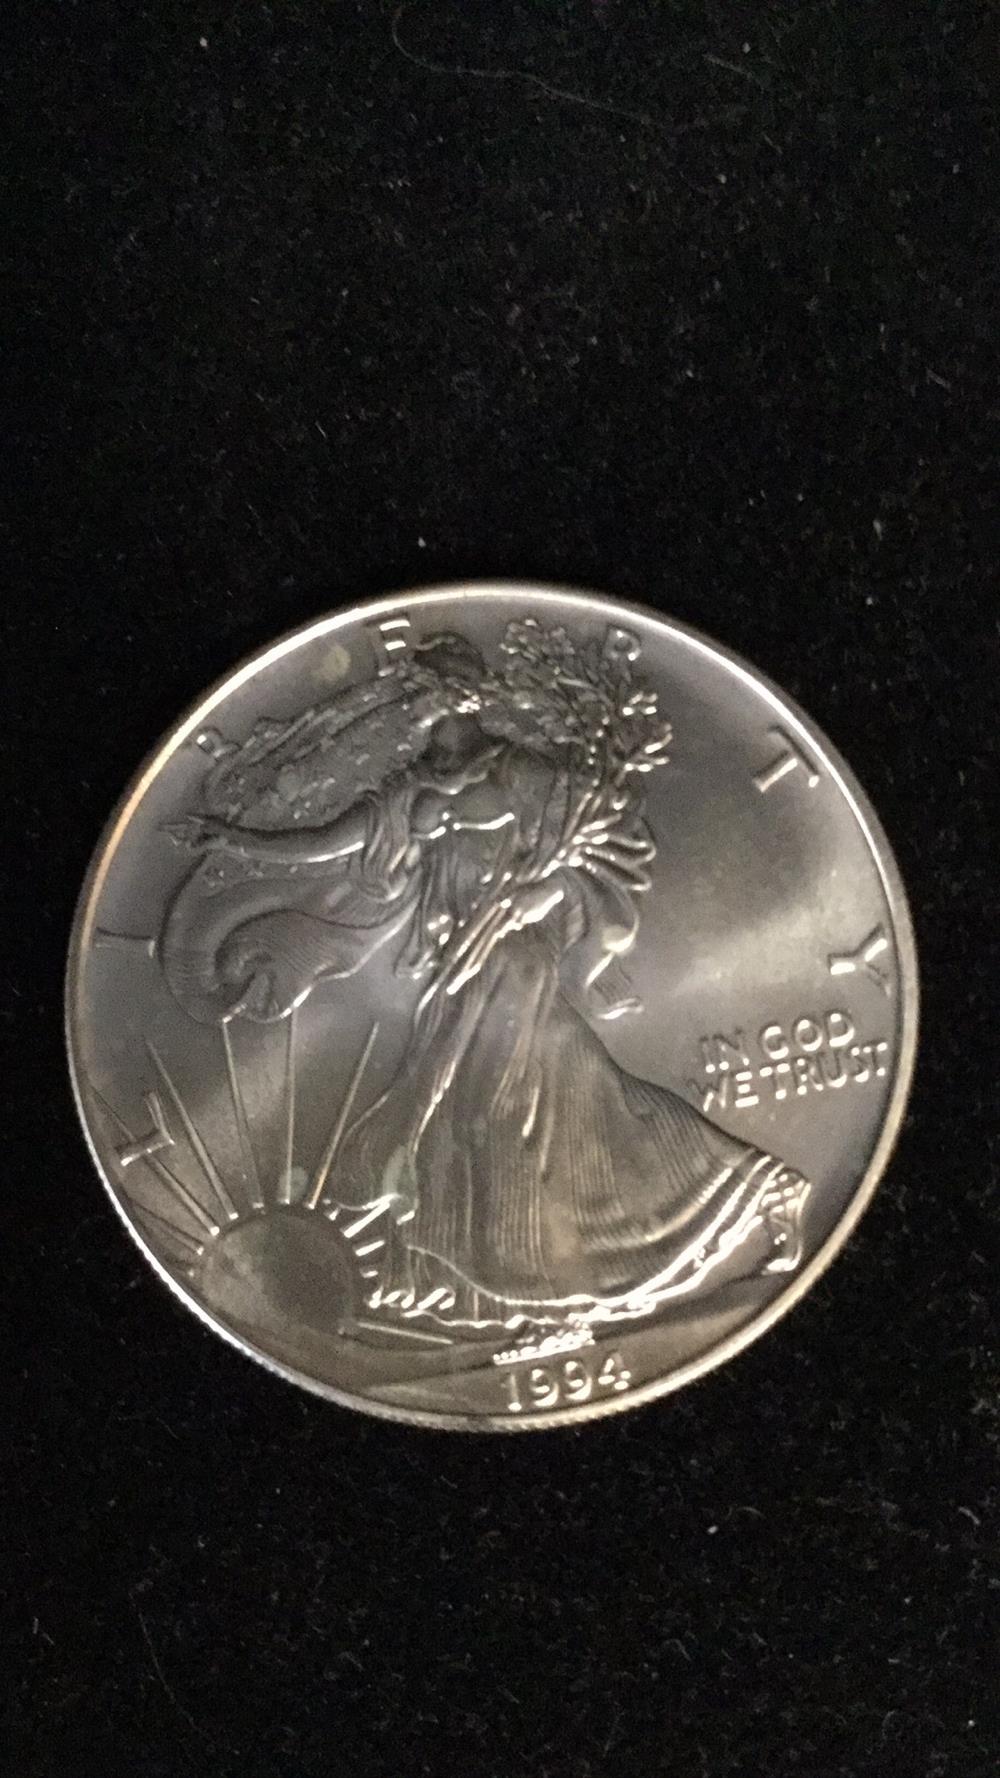 Lot 12: 1994 American eagle